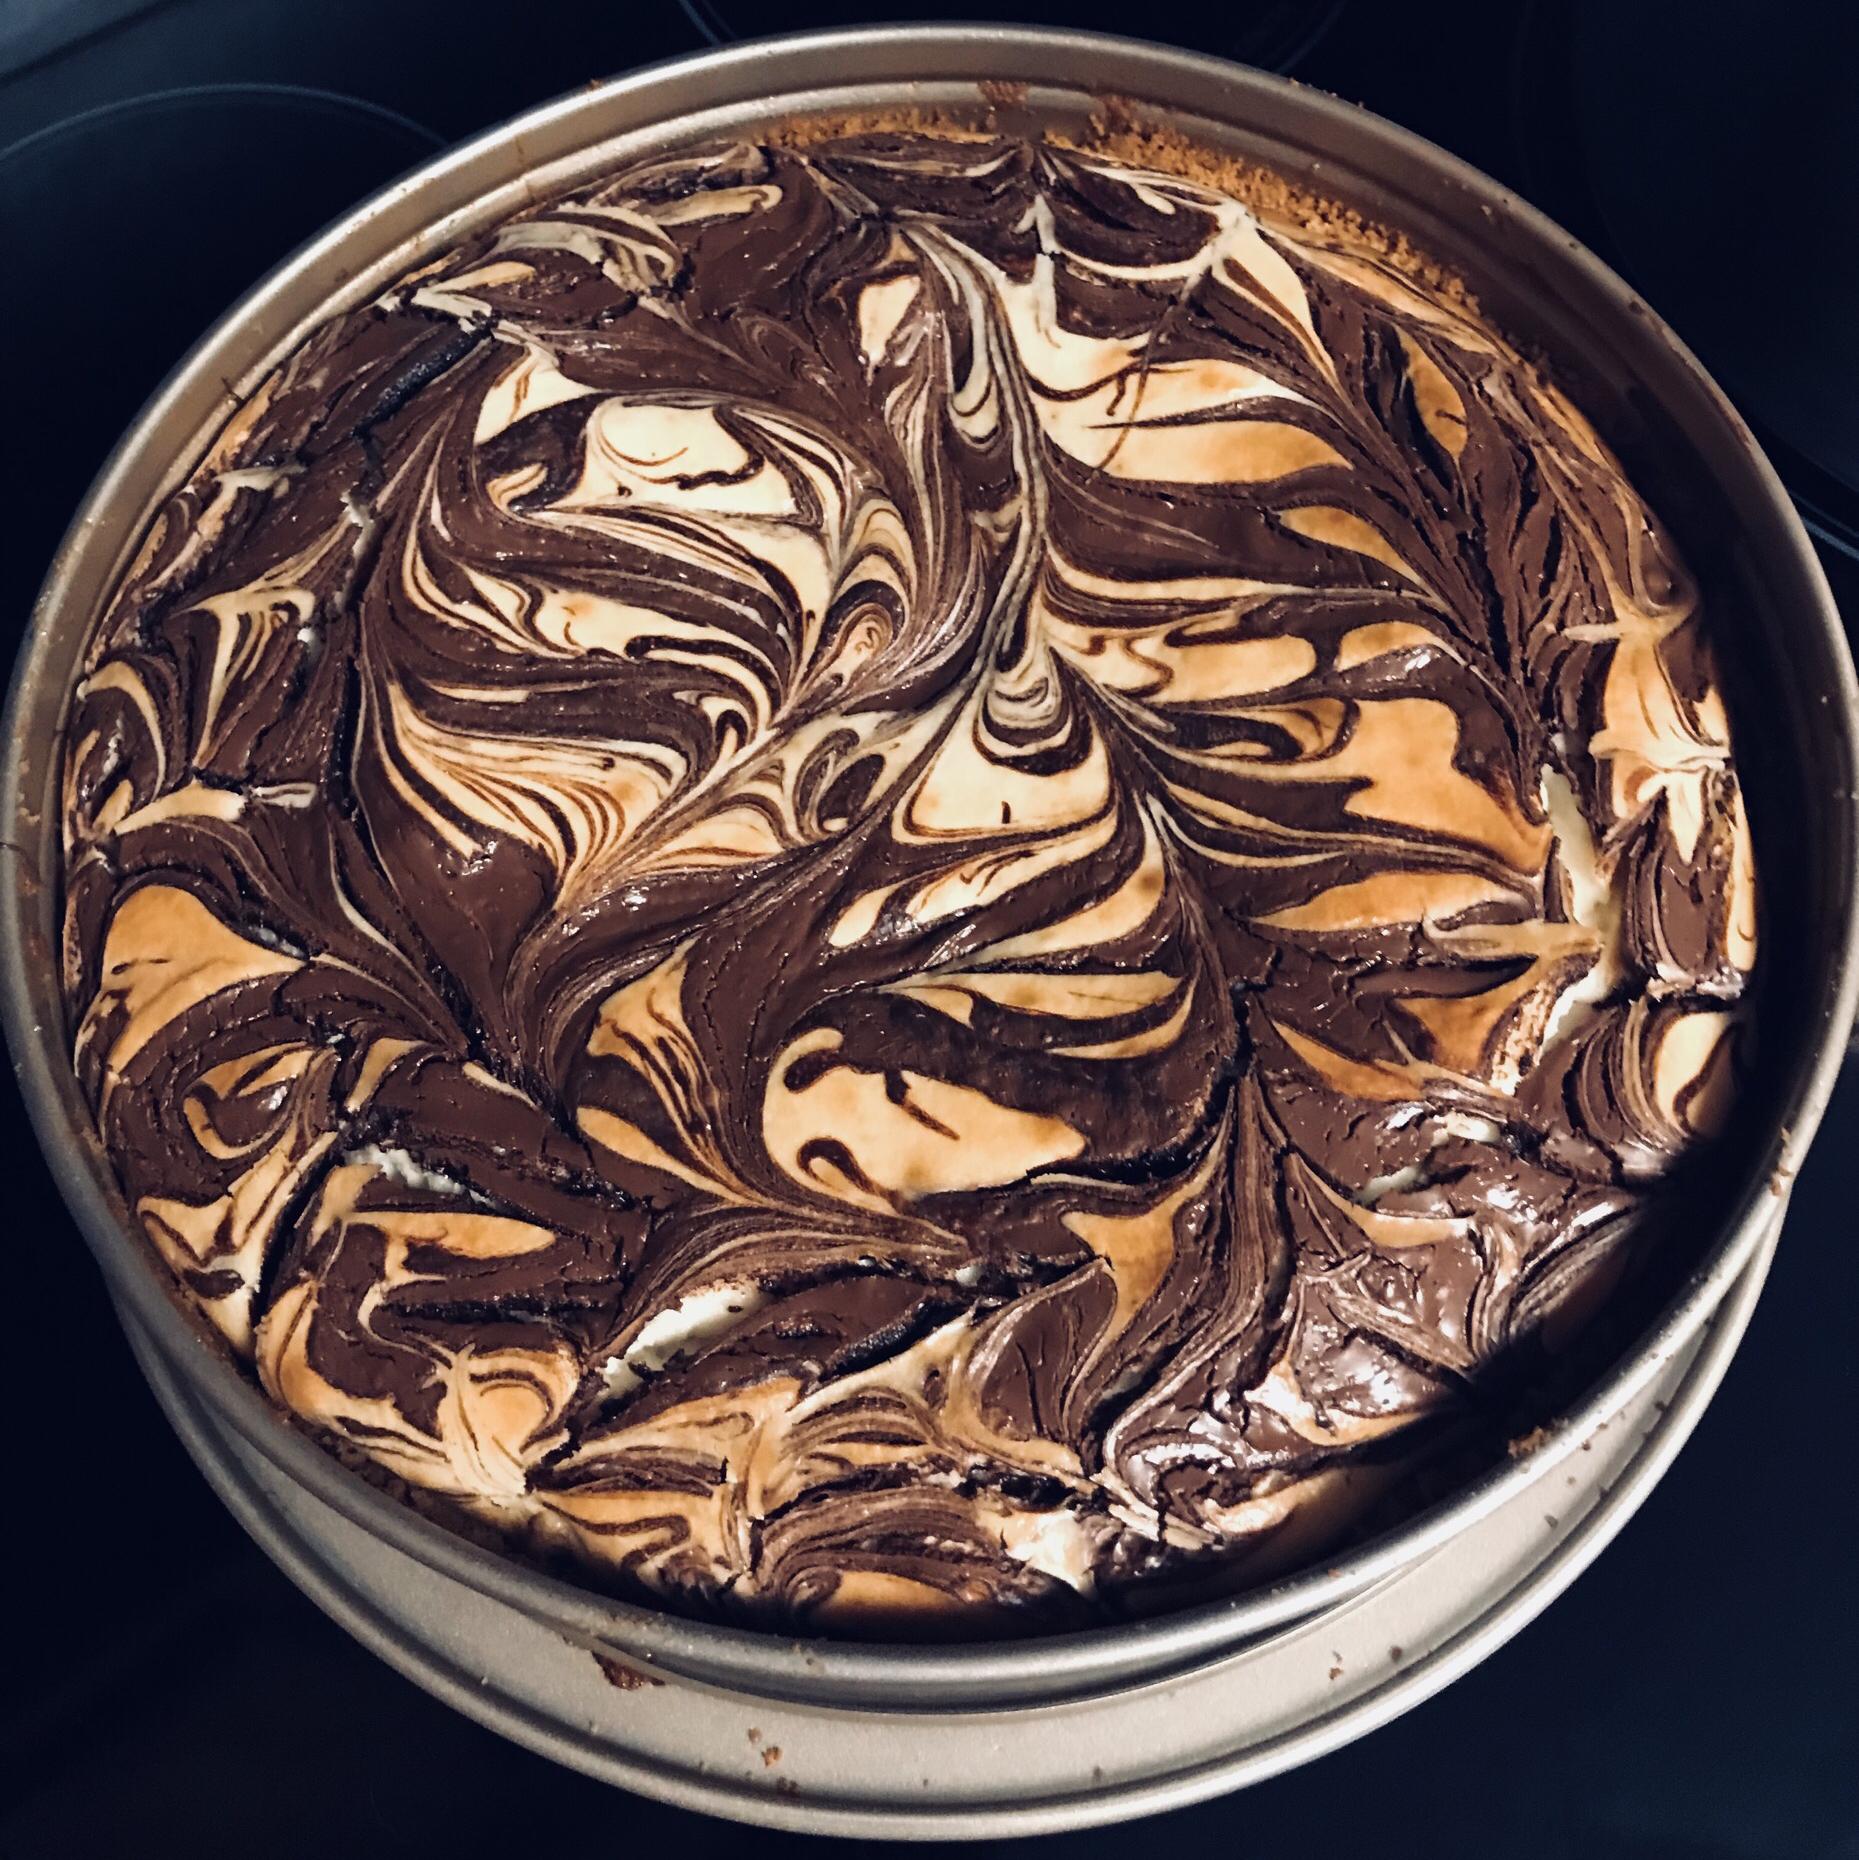 Turtles® Cheesecake